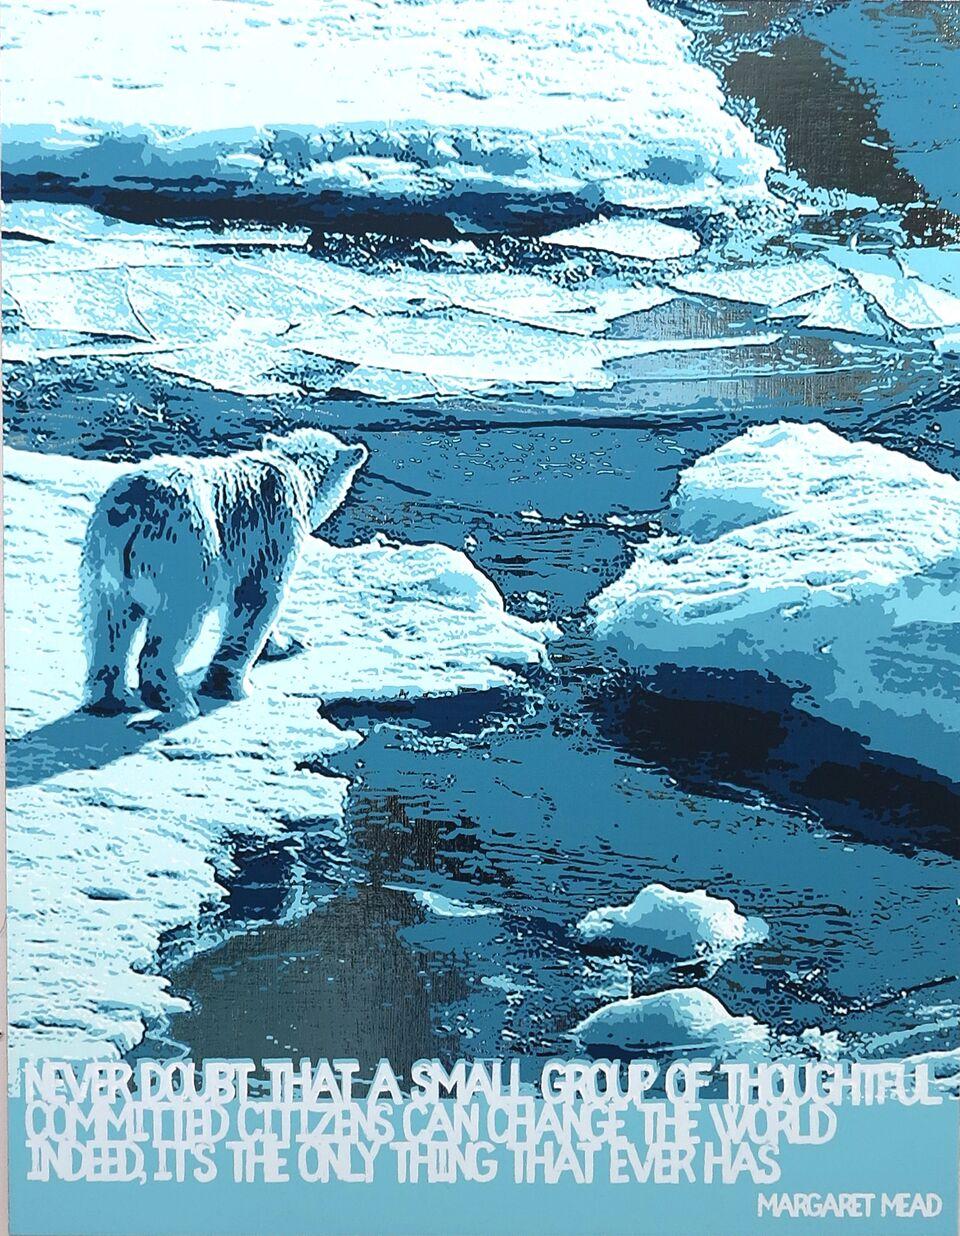 Polar Bear/Global Warming (Margaret Mead)